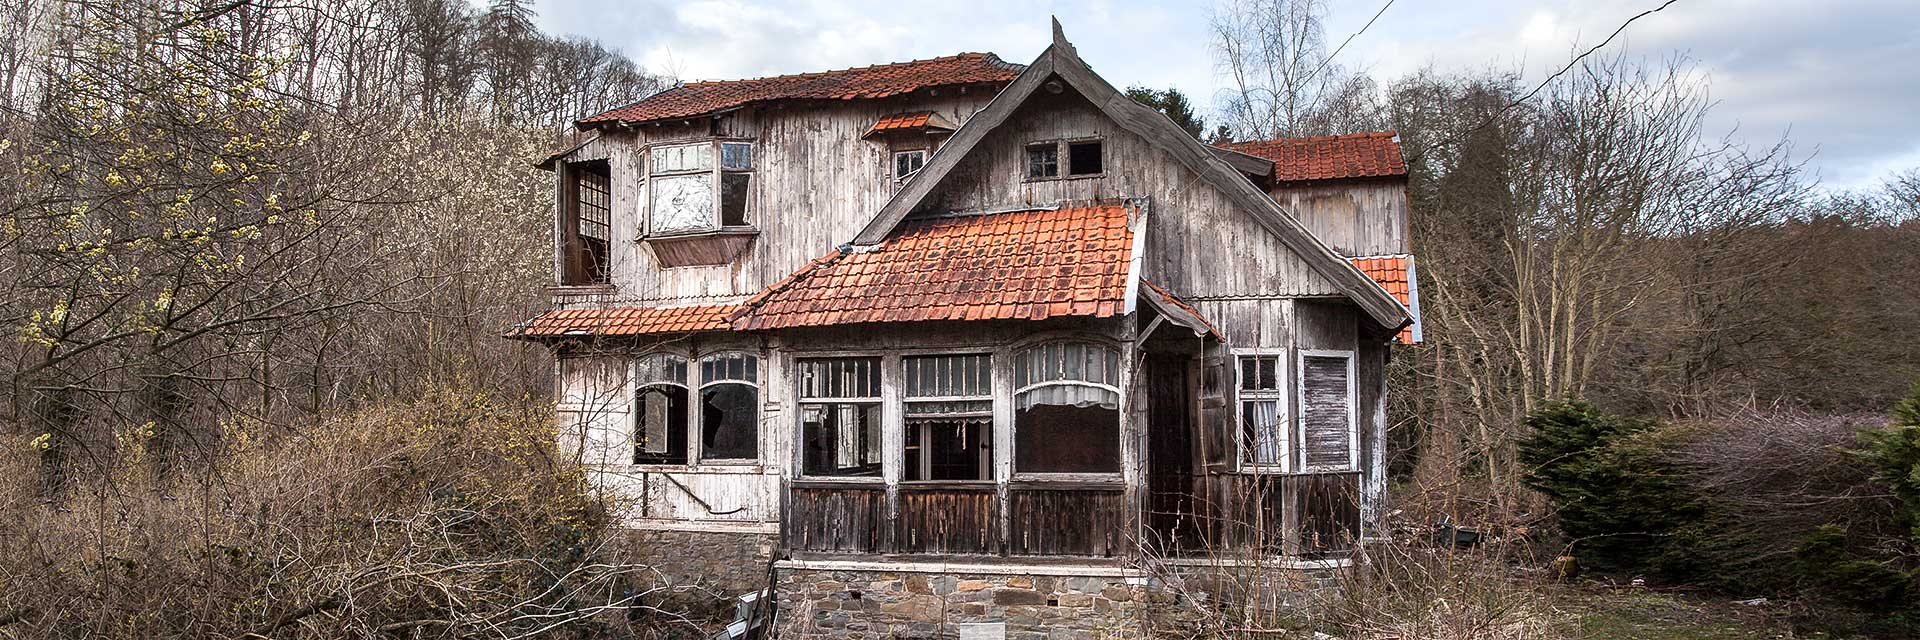 Urbex, verlaten gebouwen, vervallen kastelen